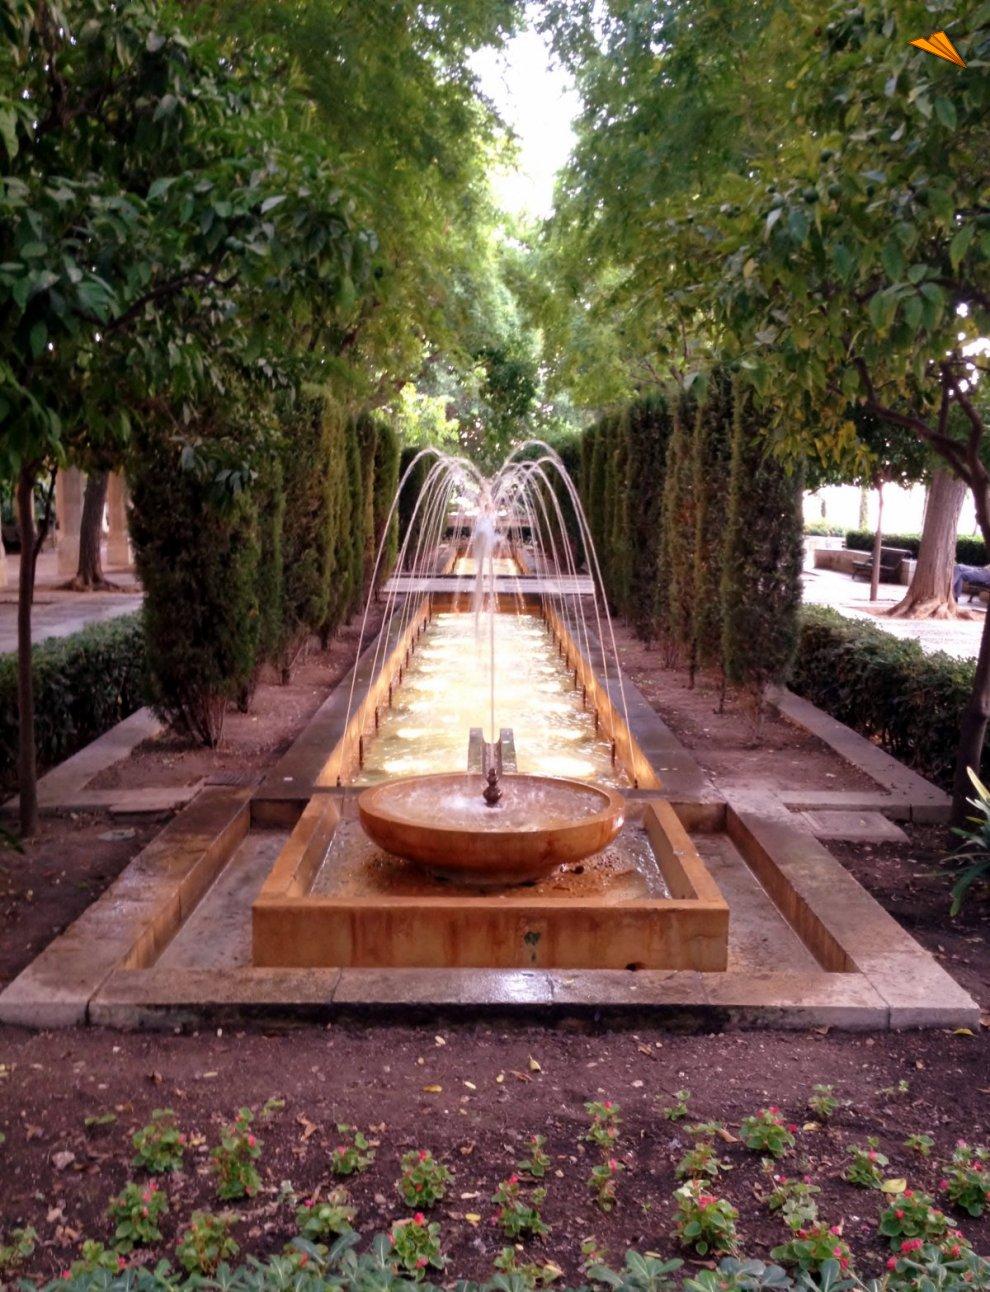 Jardines de la catedral mallorca fotos de viajes for Jardines mallorca